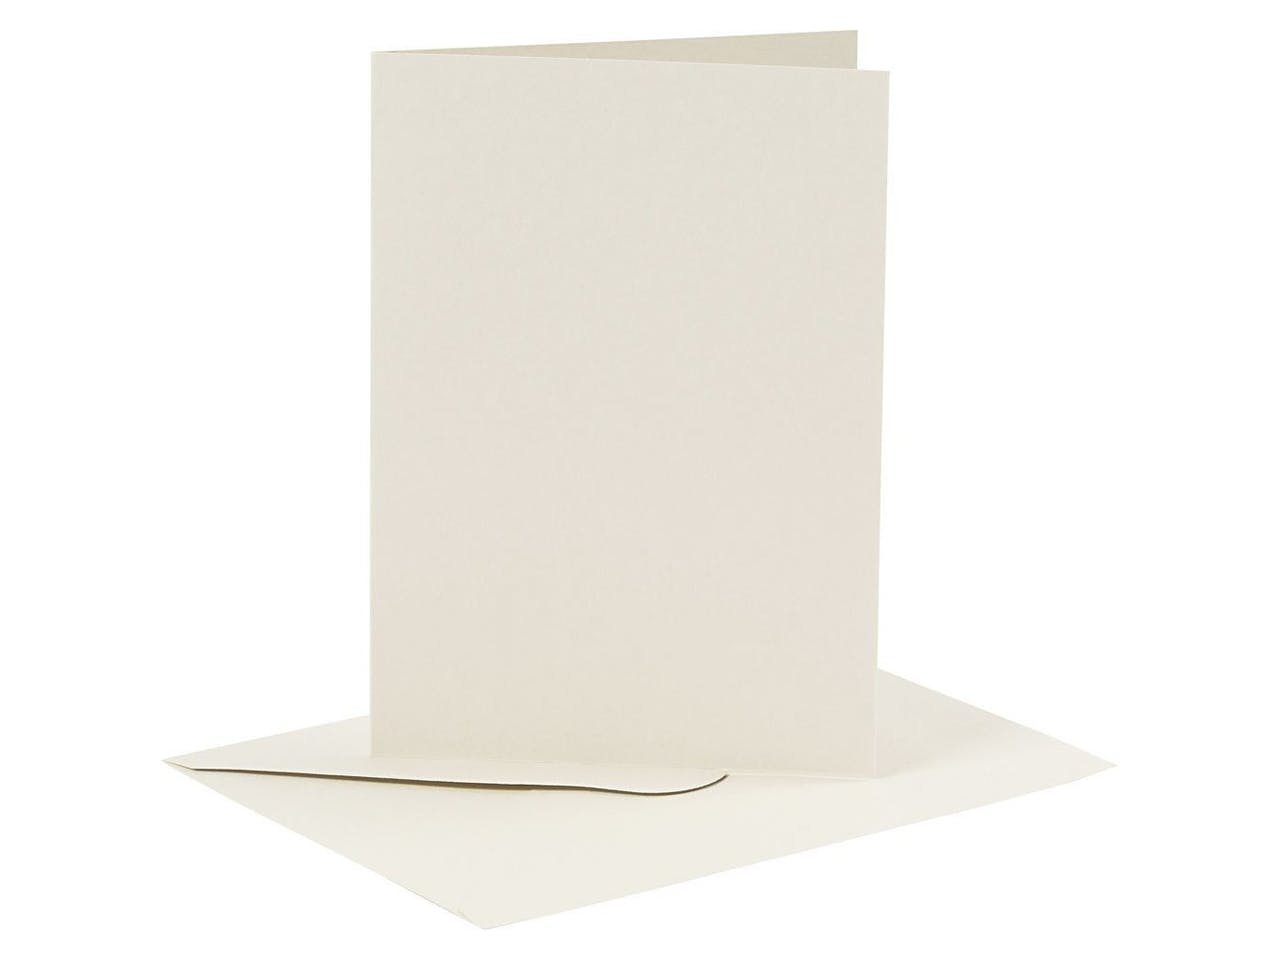 Blankokarten-Set, je 6 Klappkarten A6 & Kuverts C6, creme